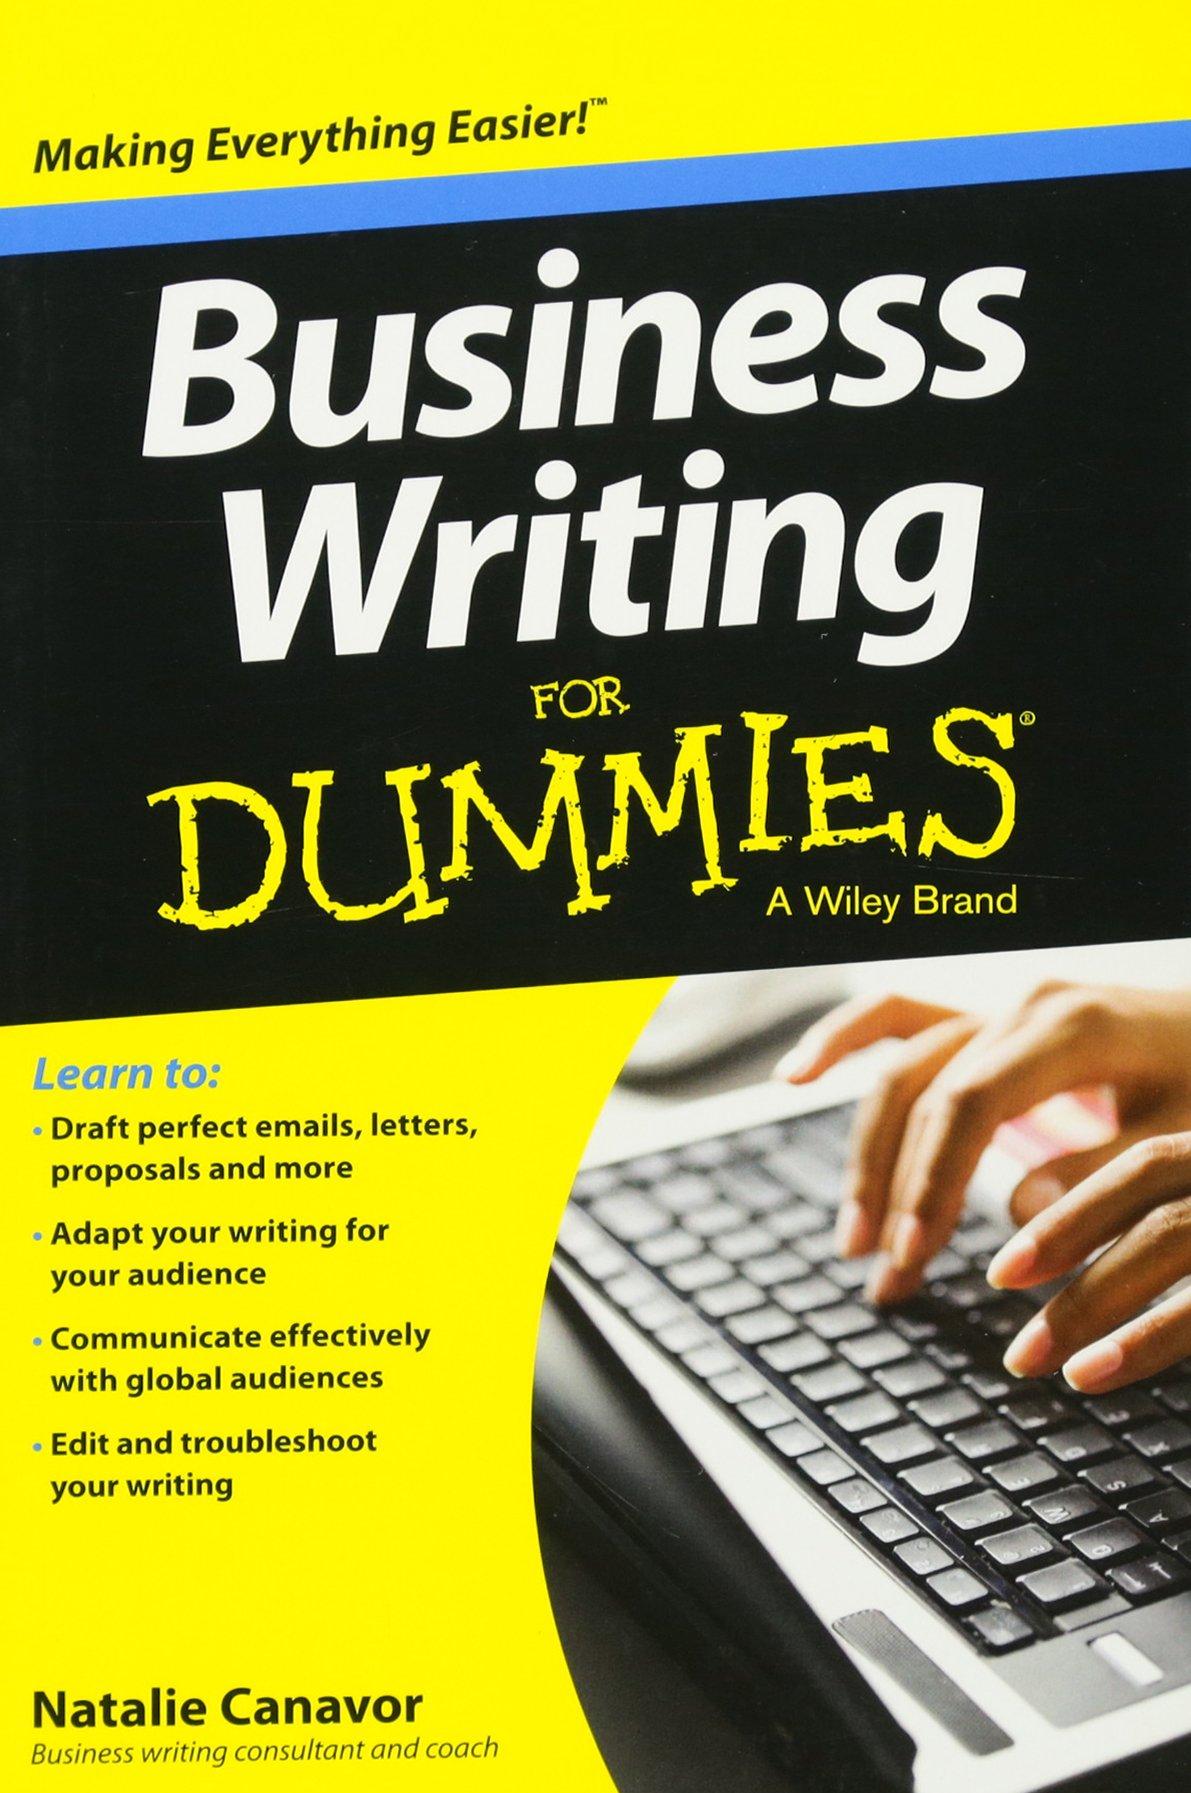 Business Writing For Dummies: Natalie Canavor: 9781118583647: Amazon.com:  Books